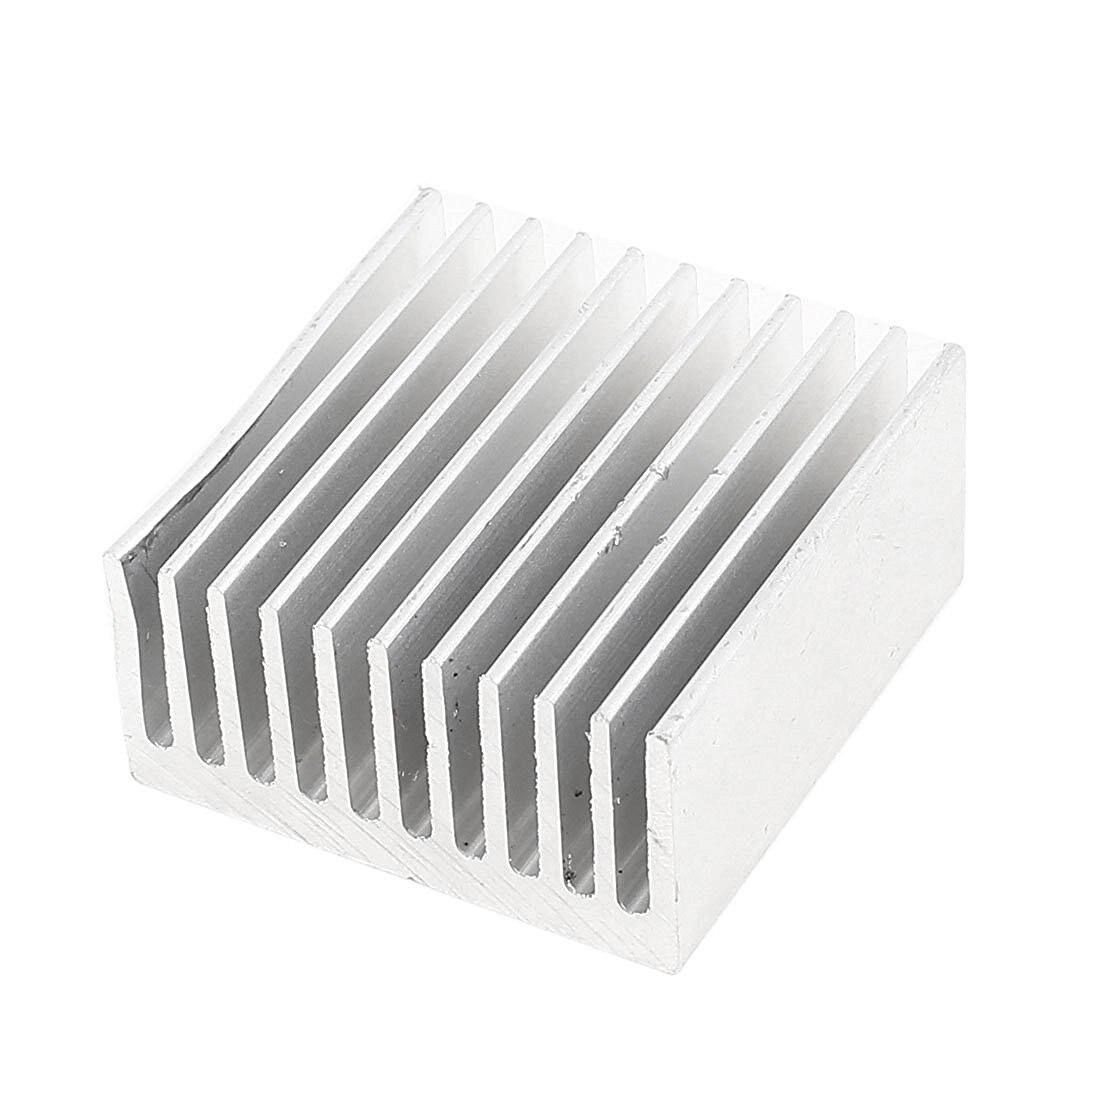 Silver Tone Aluminum Cooler Radiator Heat Sink Heatsink 40x40x20mm